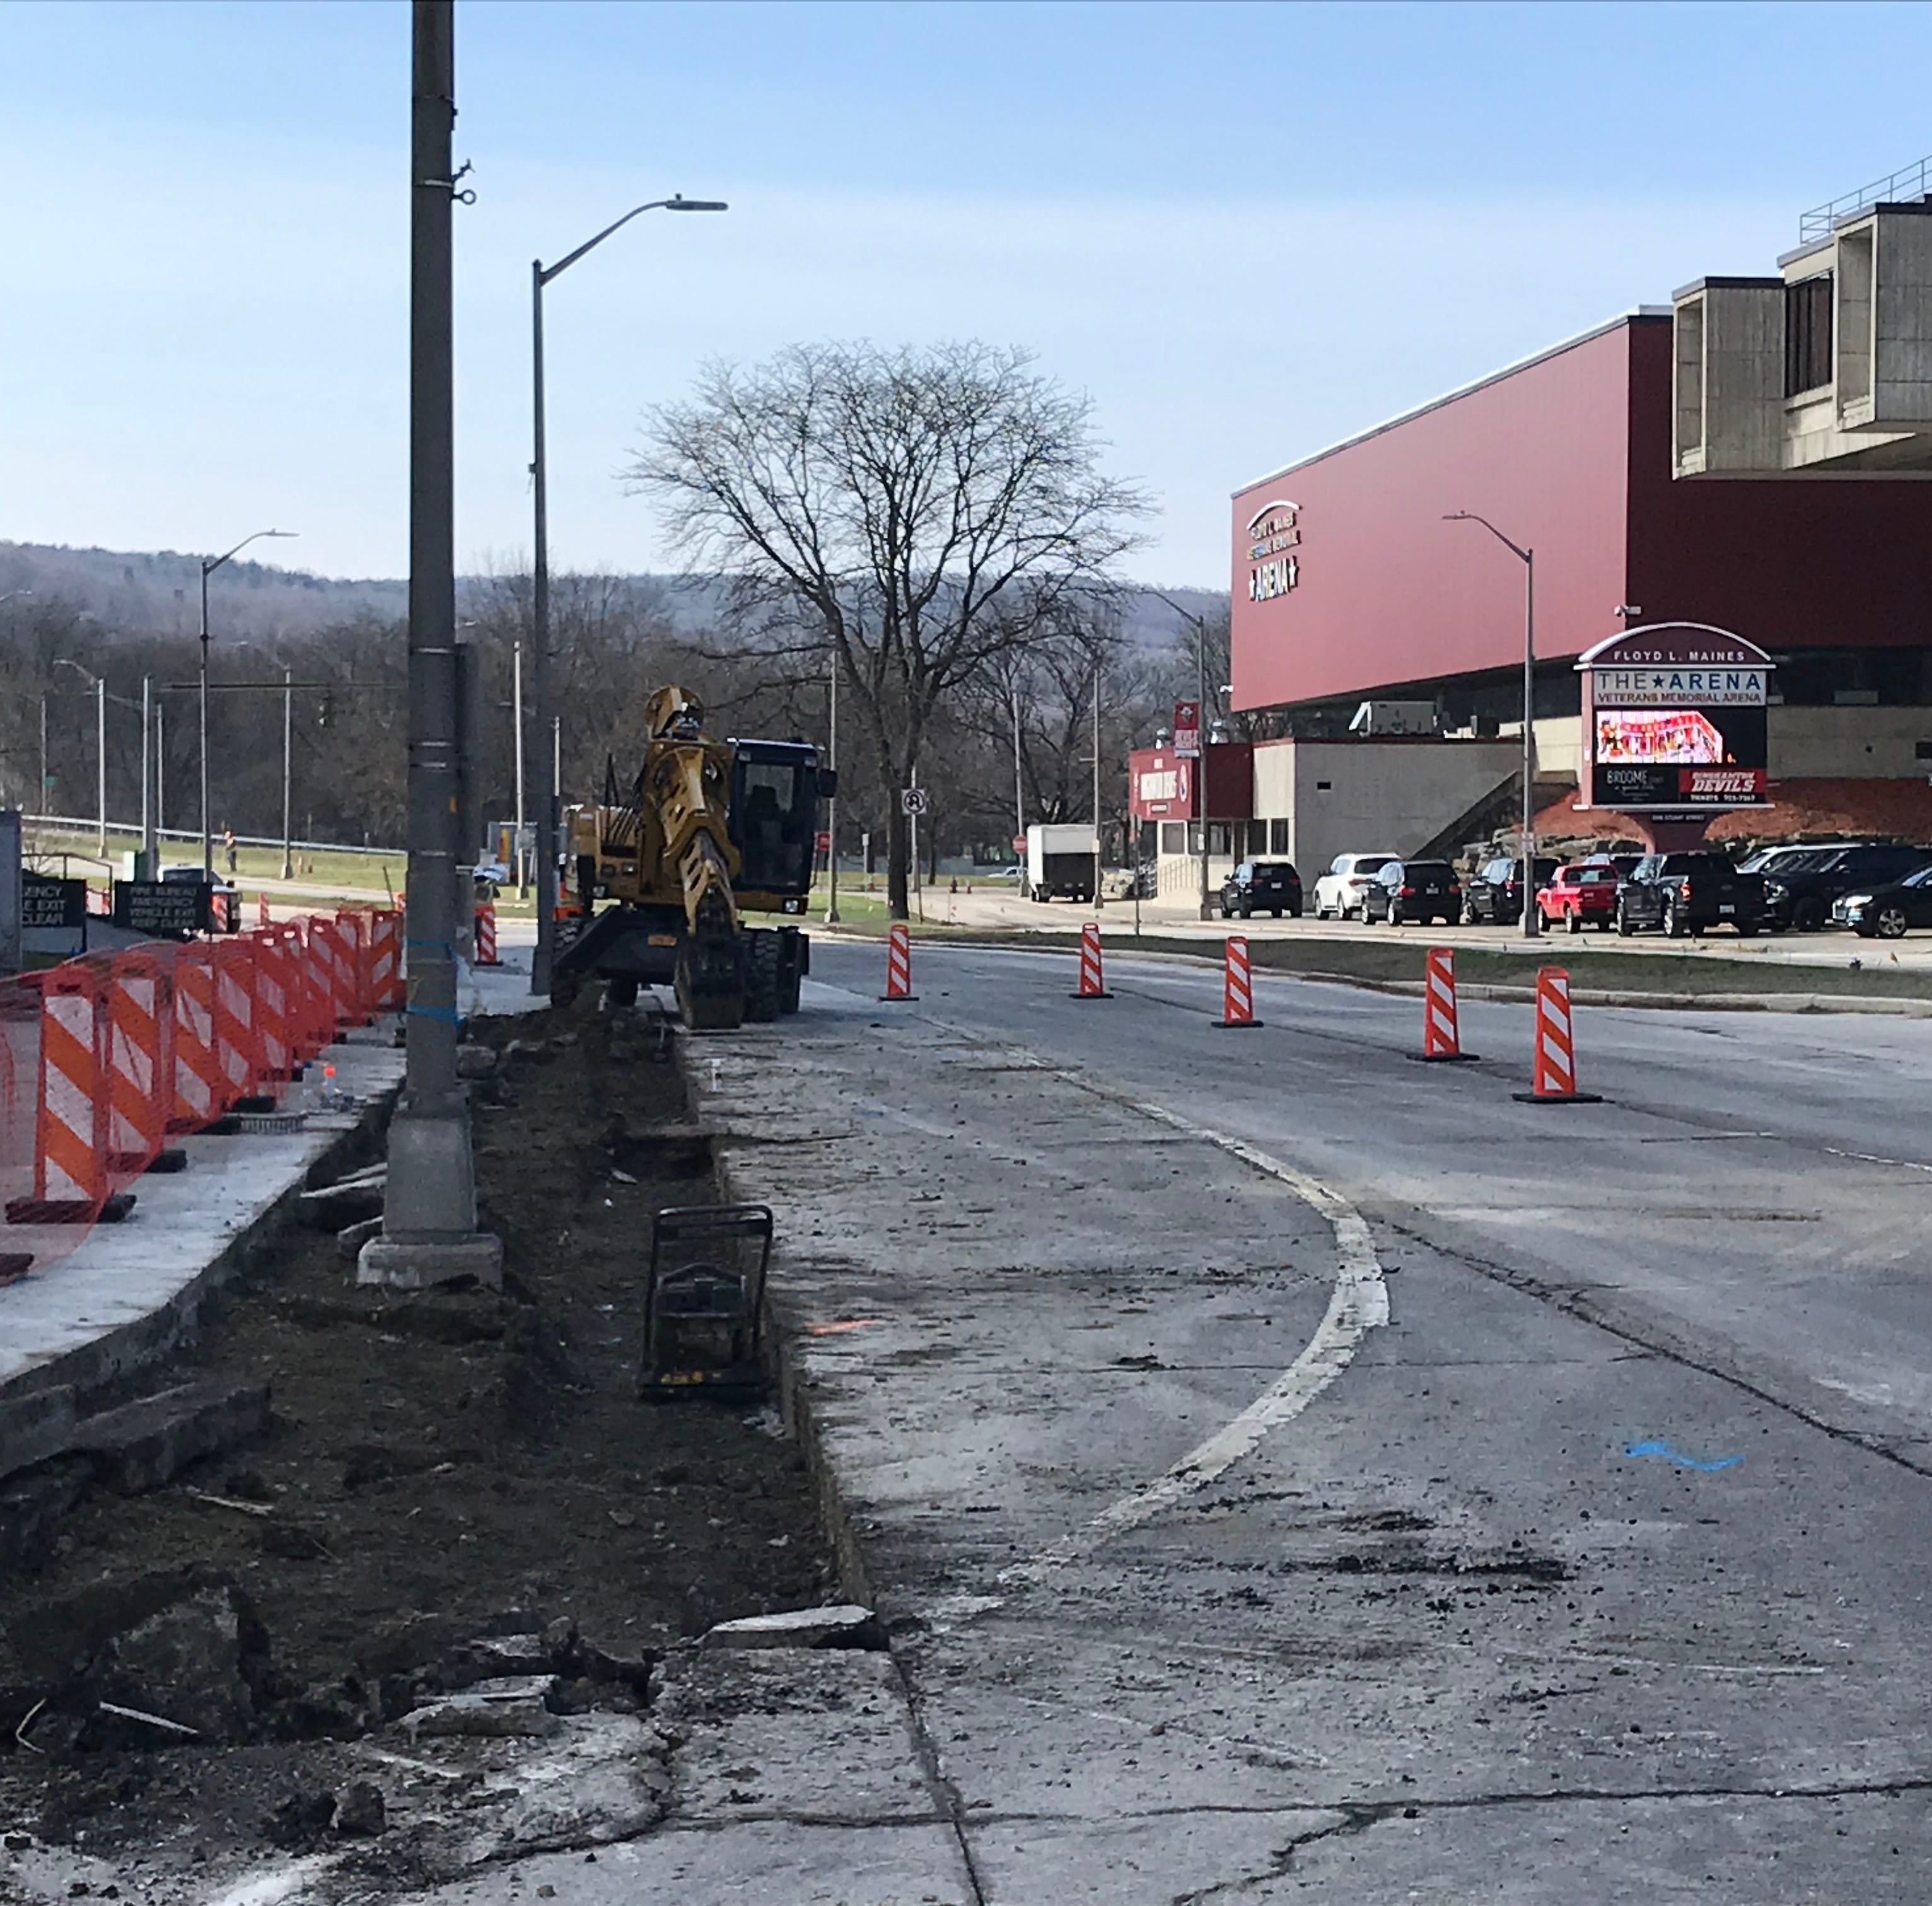 Construction underway on $2.2 million State Street Gateway Project in Binghamton